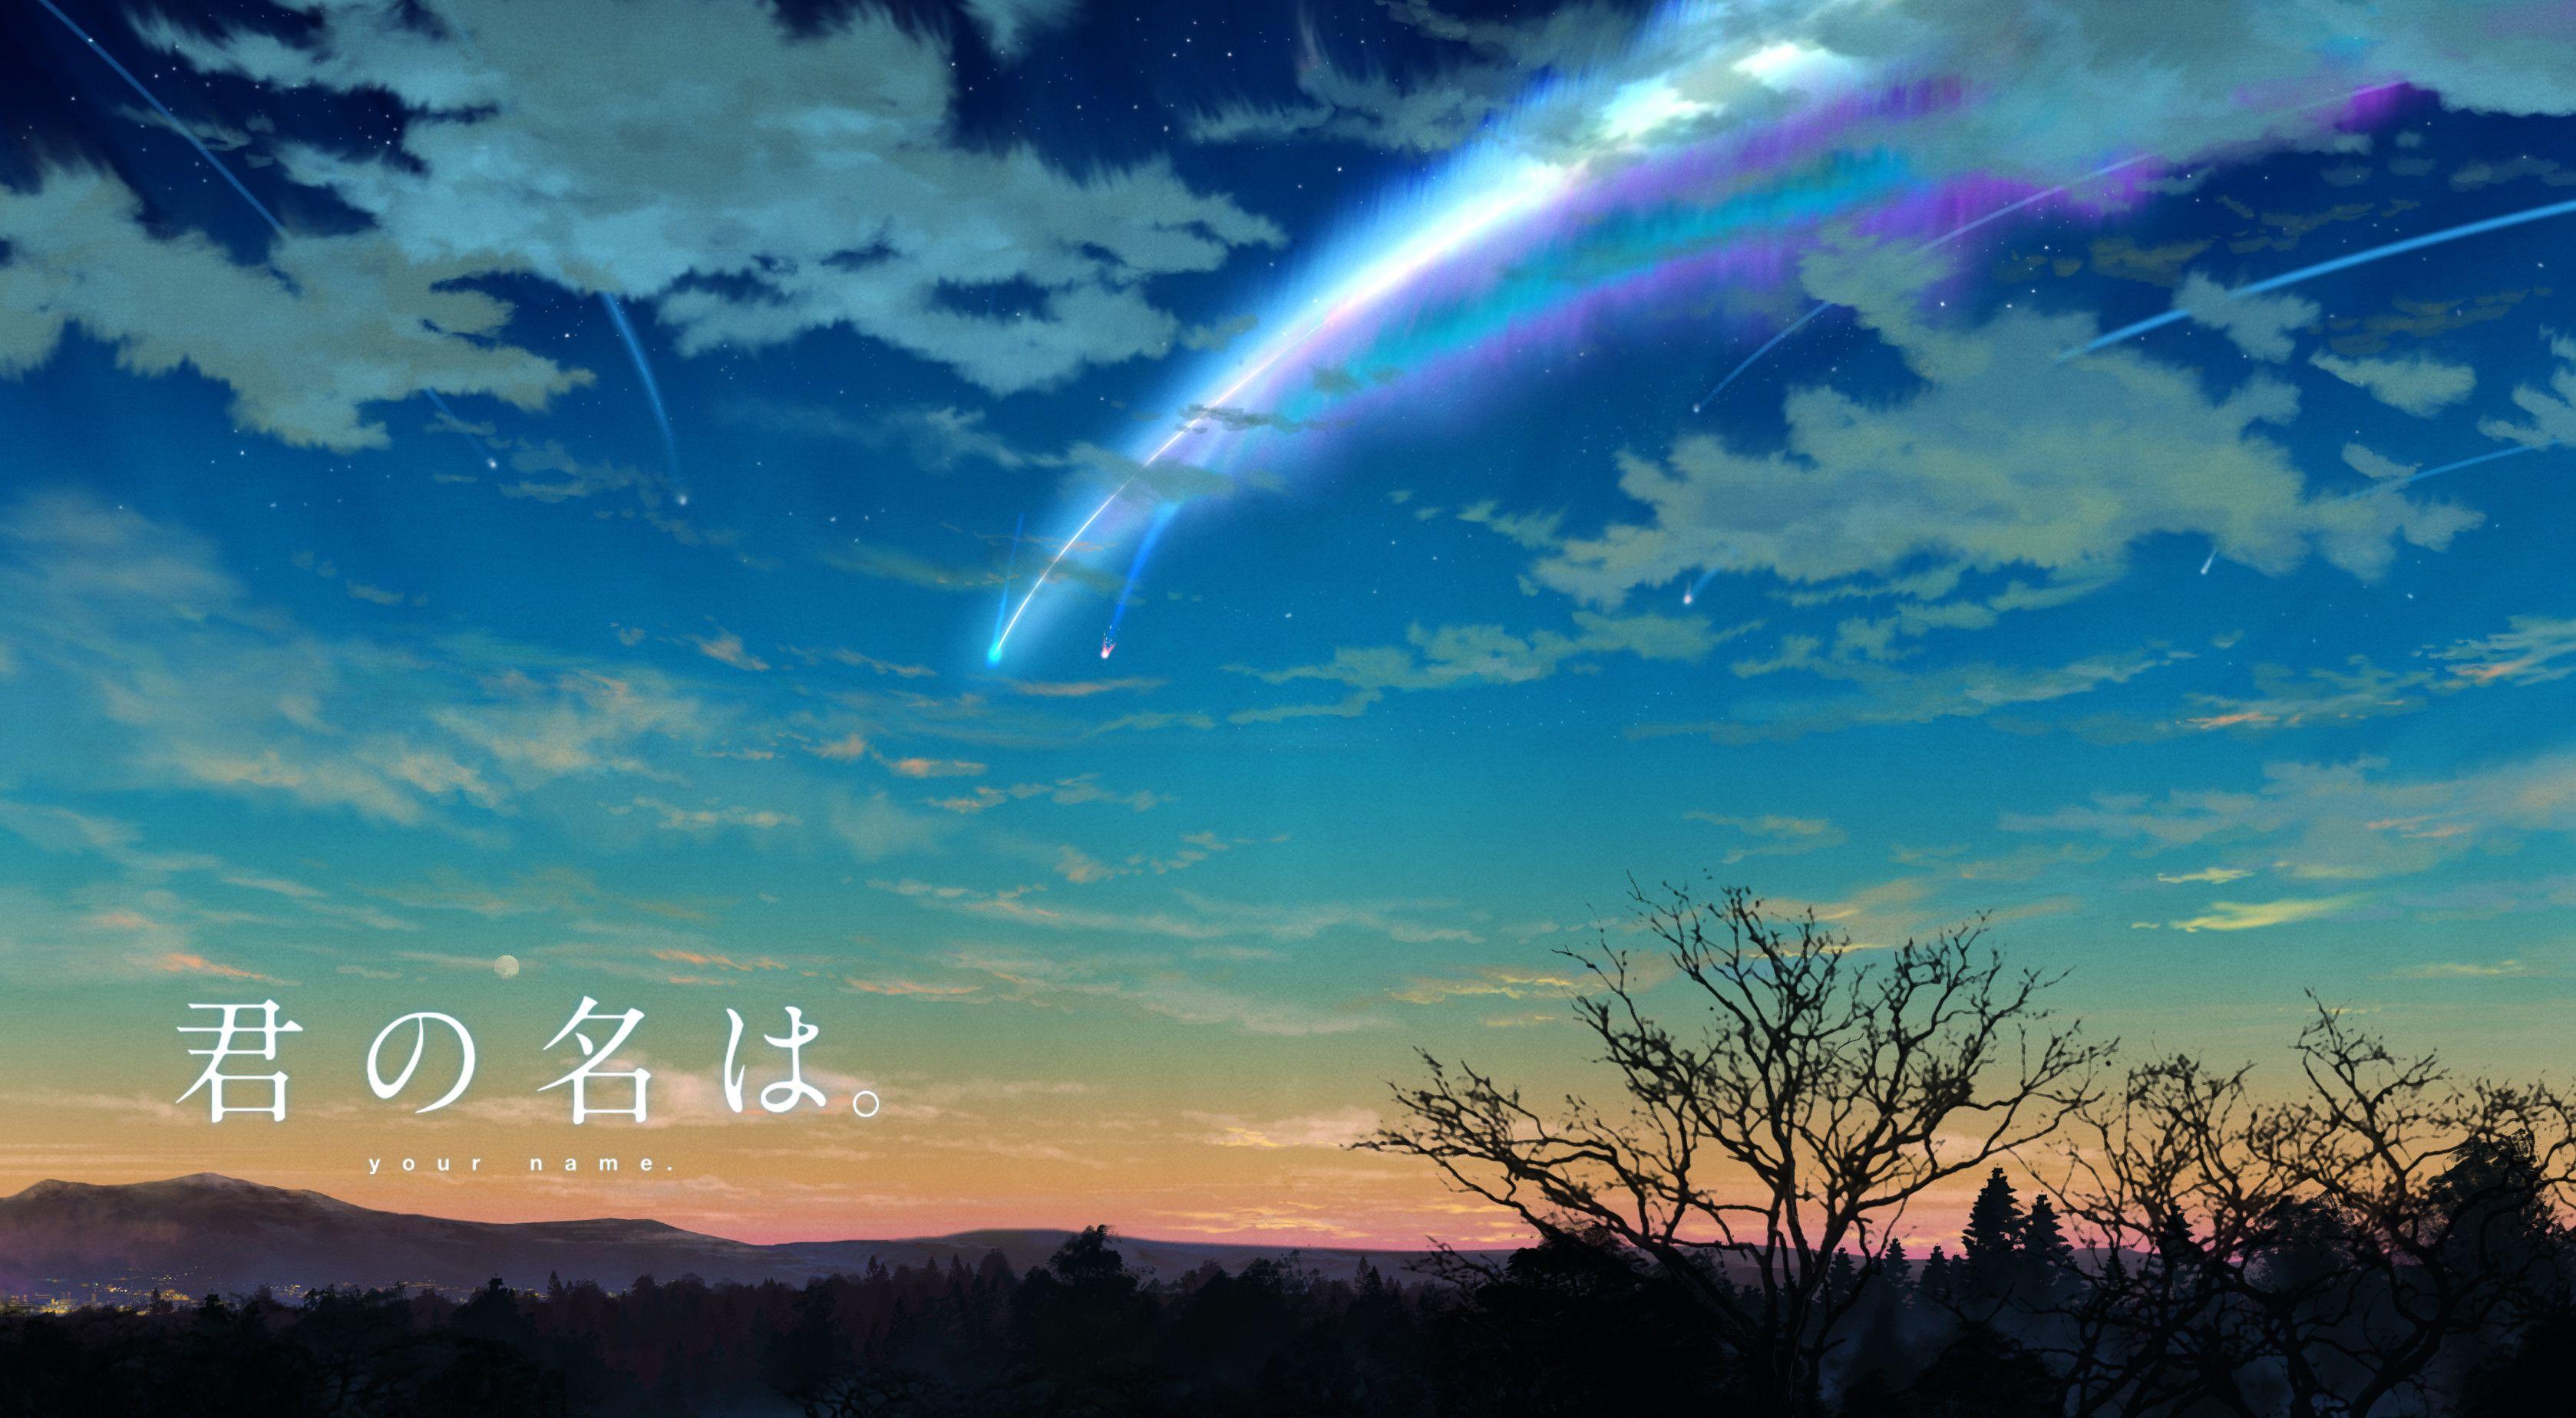 3356x1848 Anime Your Name Kimi No Na Wa Wallpaper Name Wallpaper Your Name Wallpaper Kimi No Na Wa Wallpaper